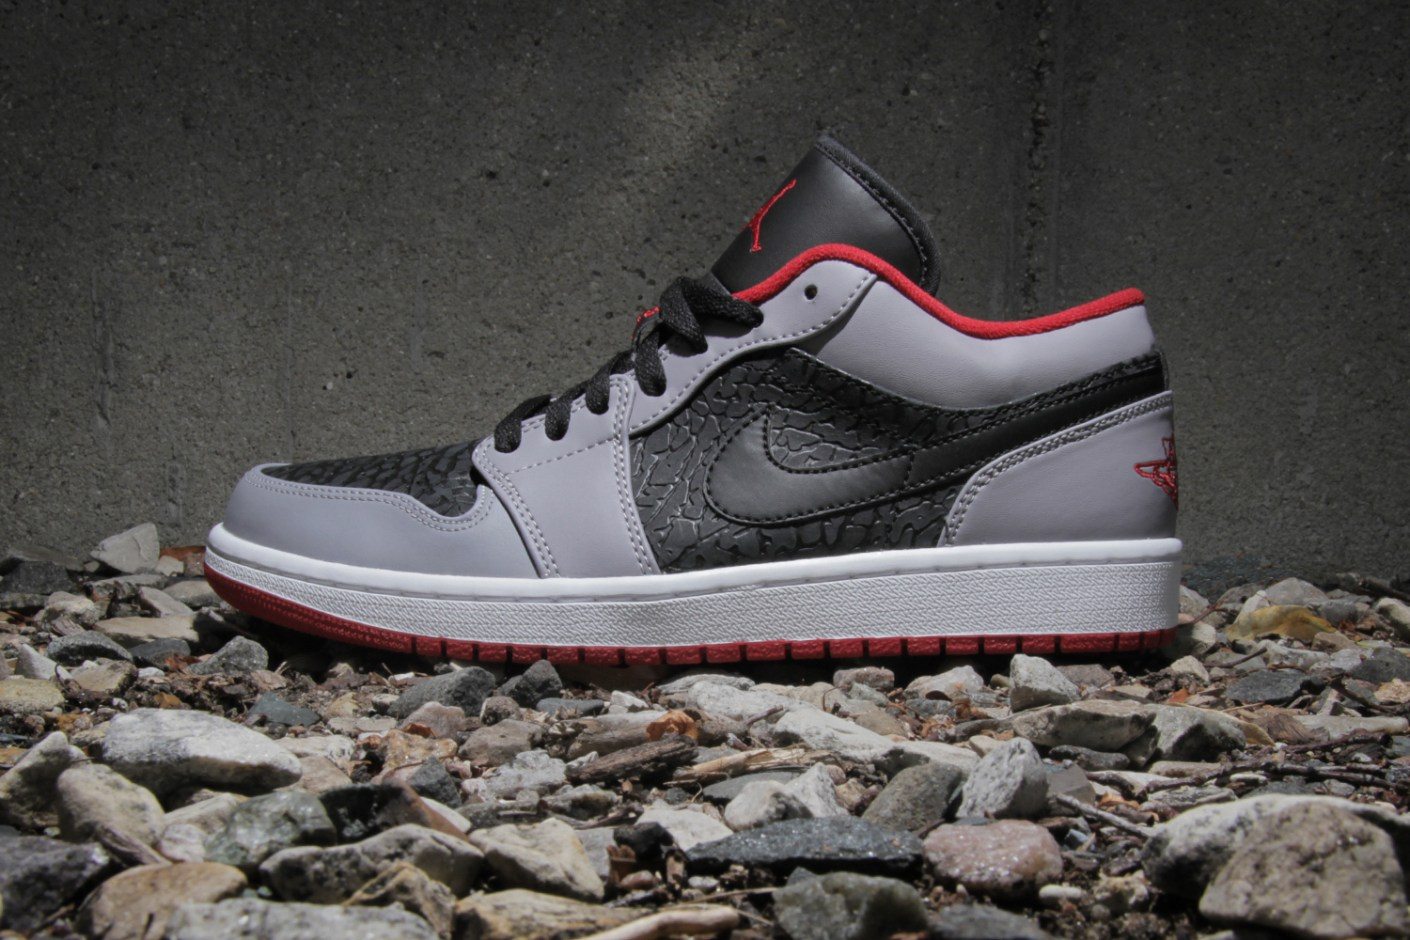 Image of Air Jordan 1 Low Black/Gym Red-Cement Grey